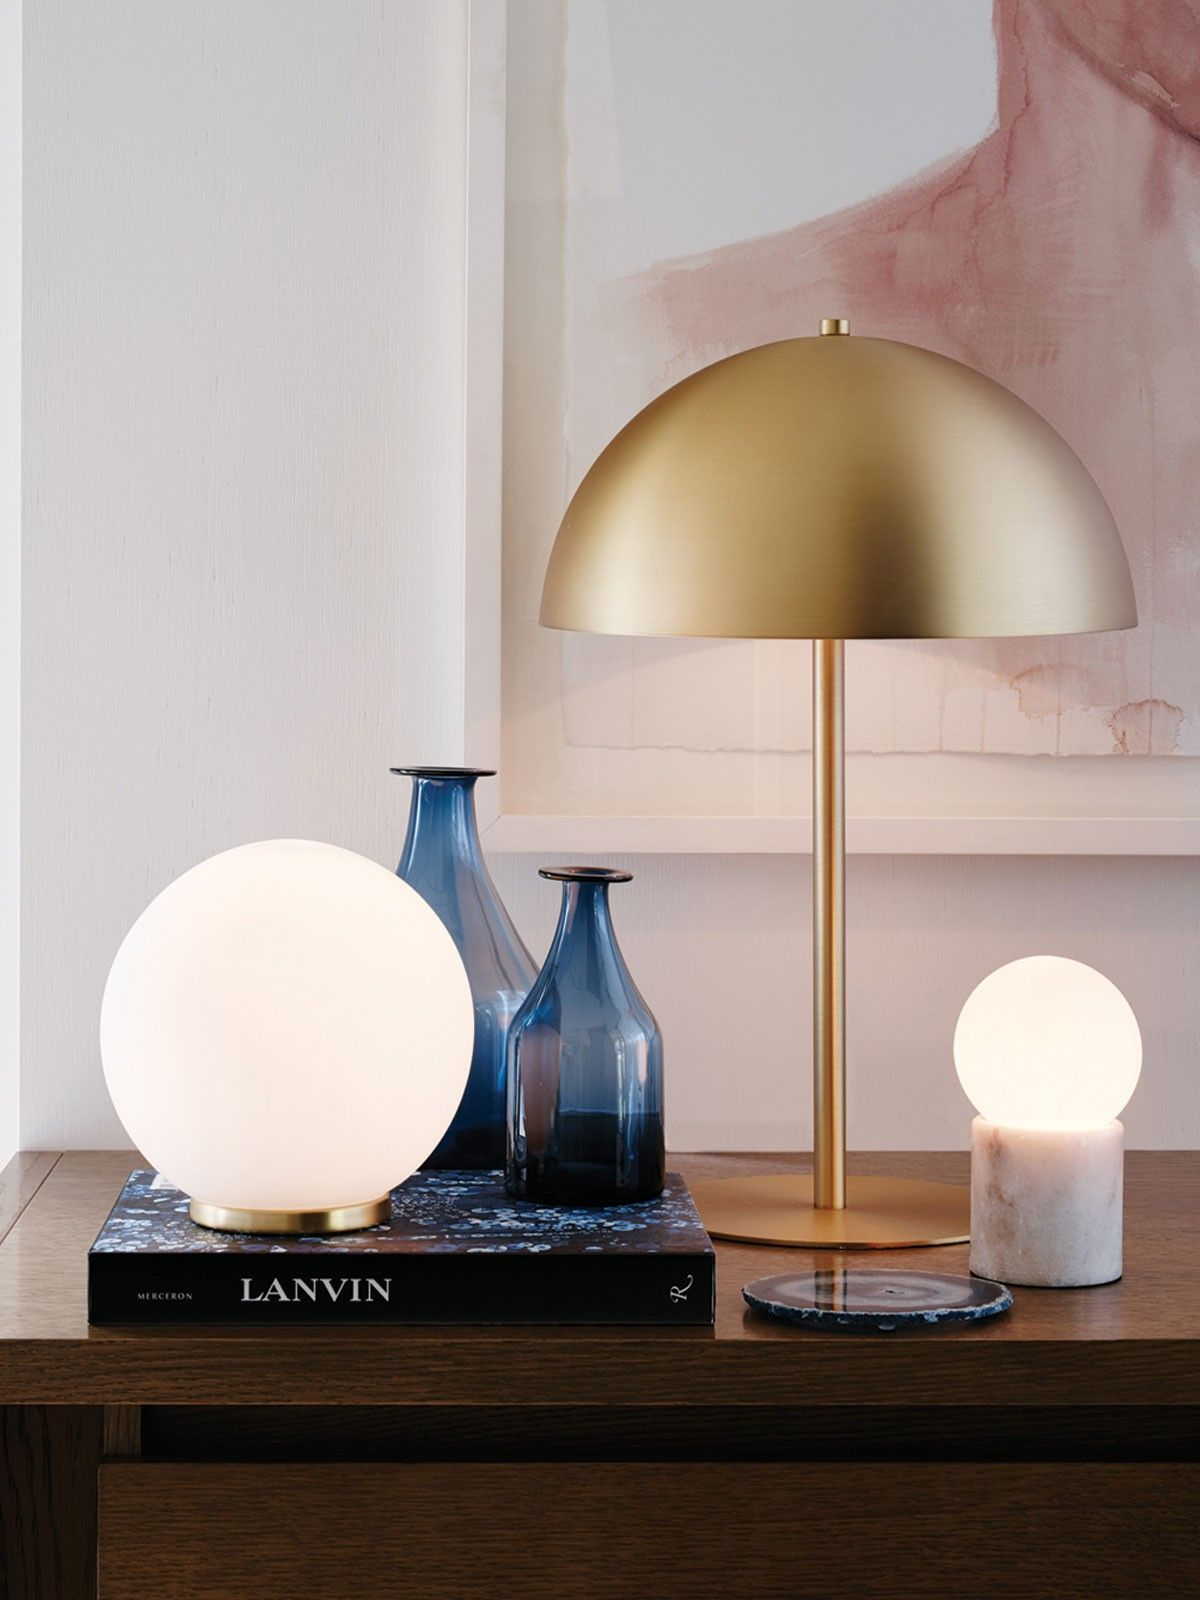 Ikea Round Lamp : round, Table, Marble, Round, Lamp,, Design,, Modern